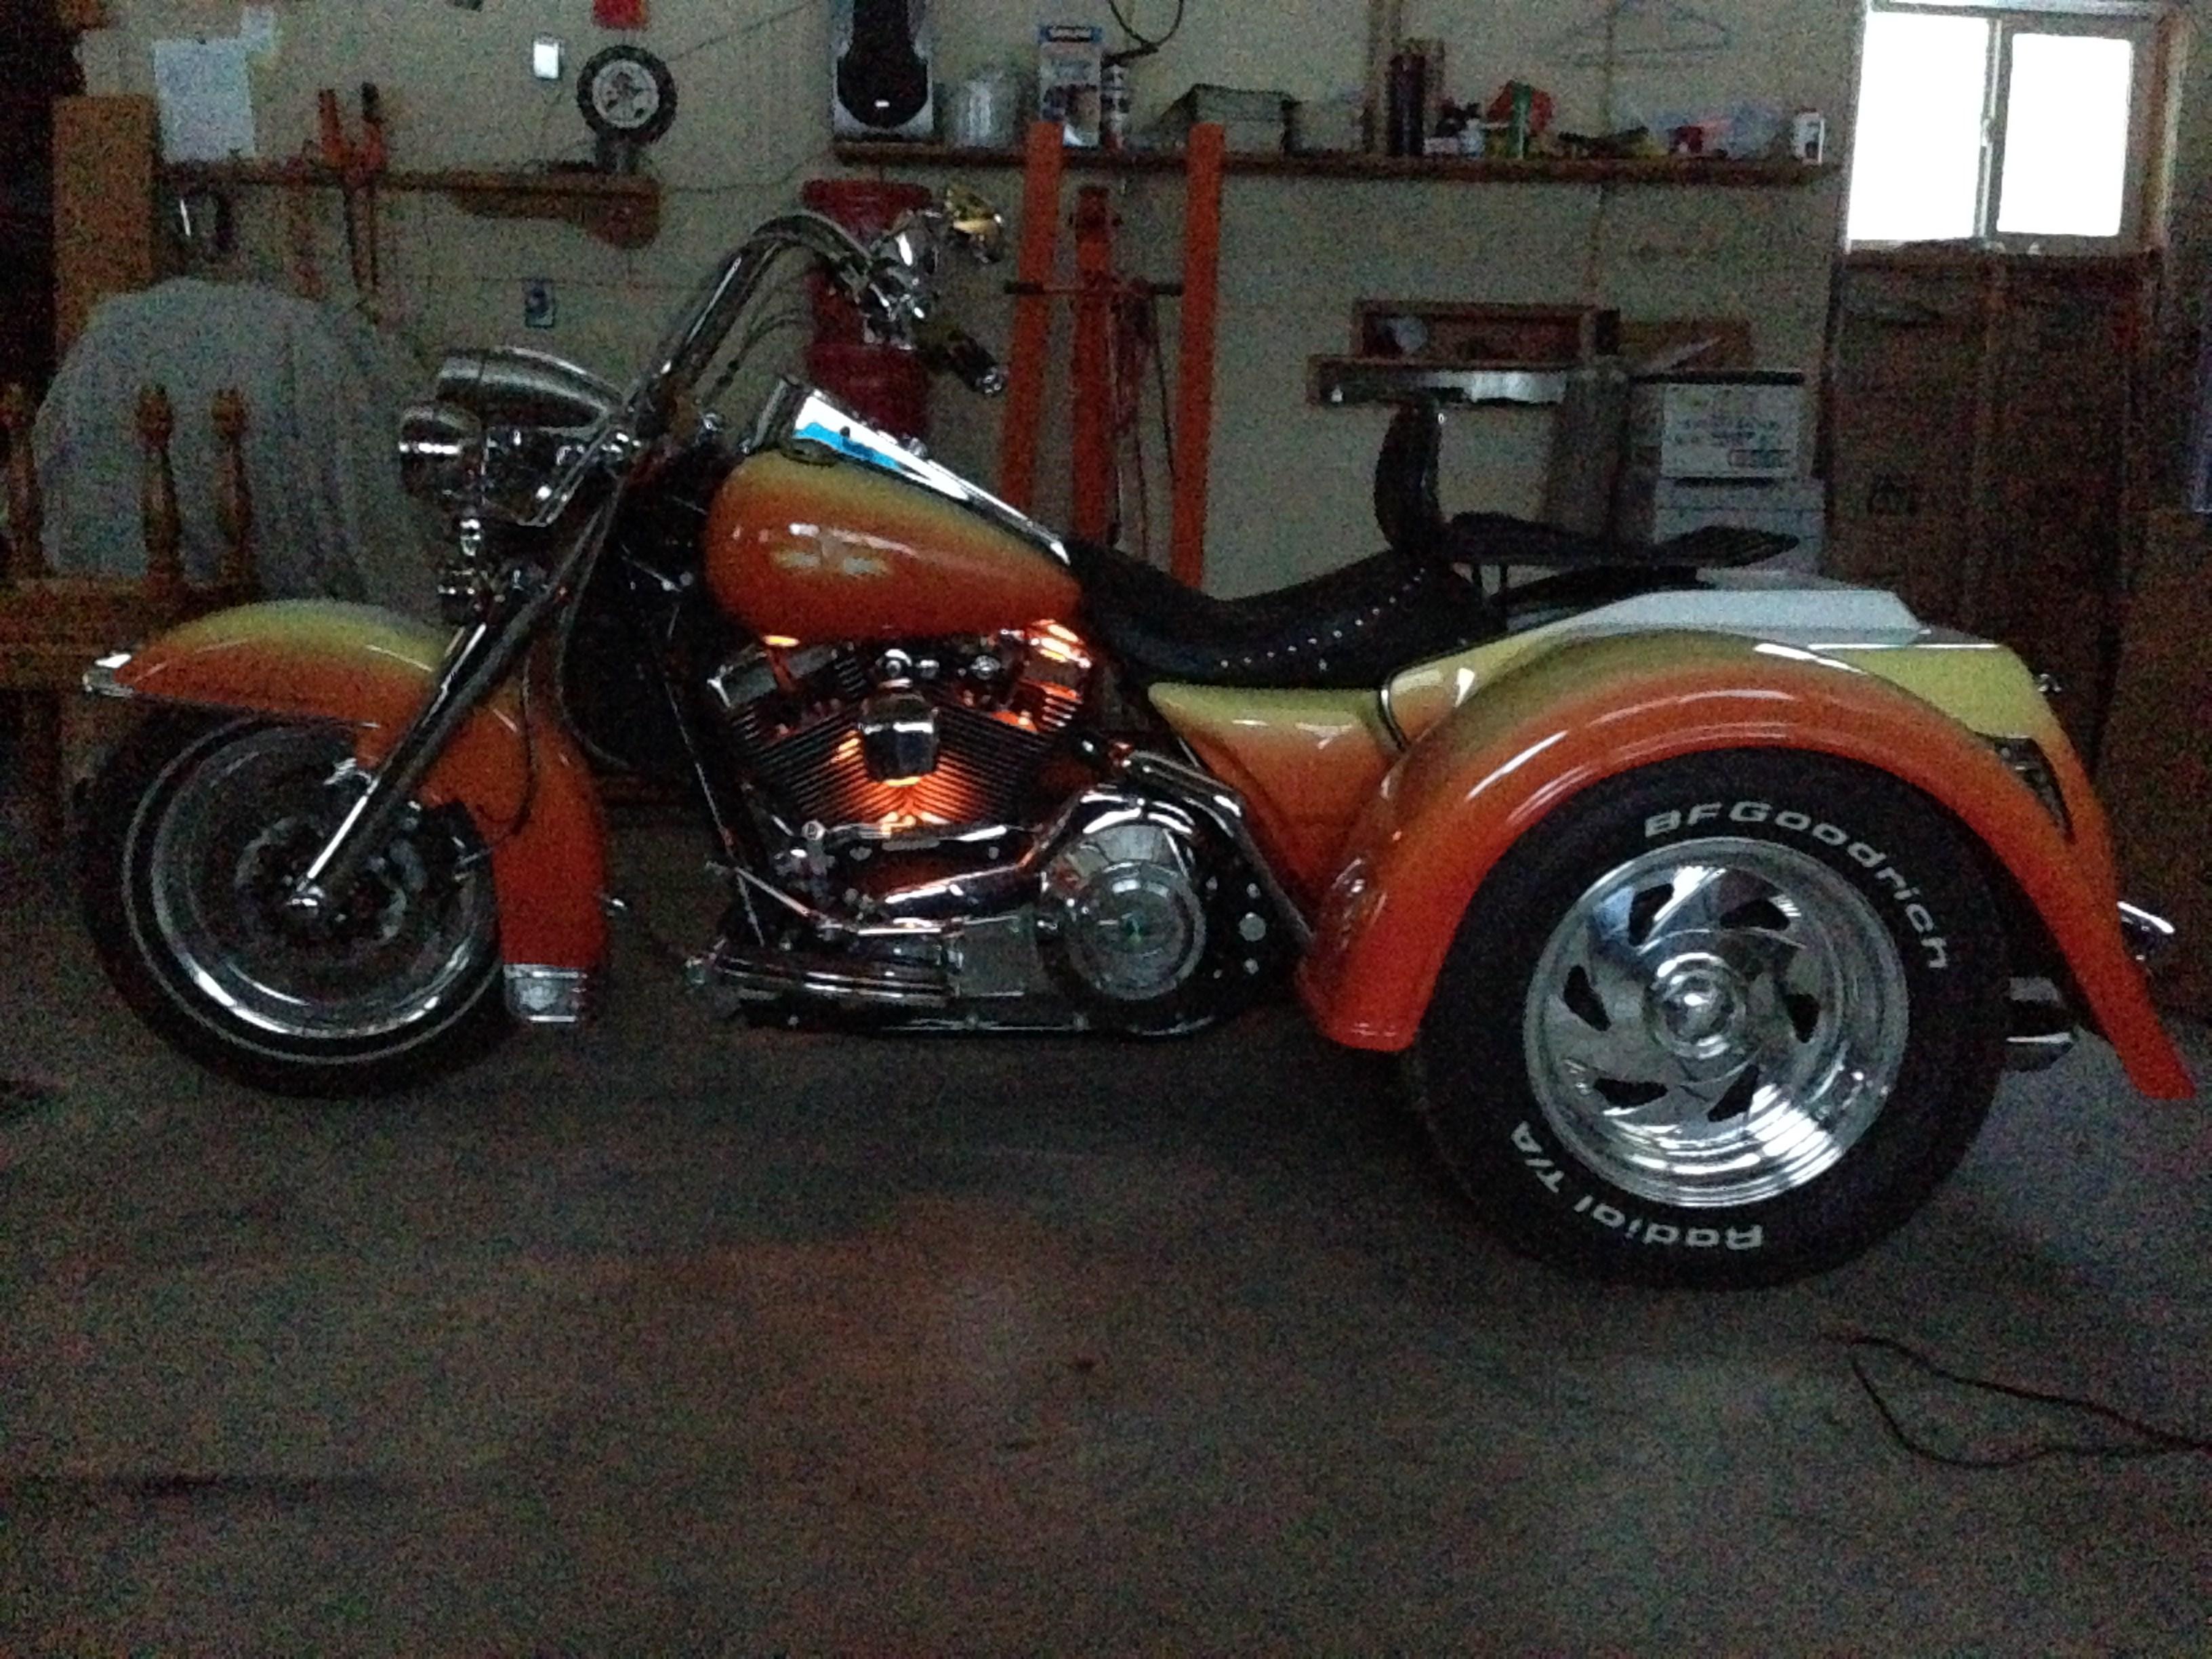 2003 Harley Davidson 174 Custom Trike Yellow Orange White